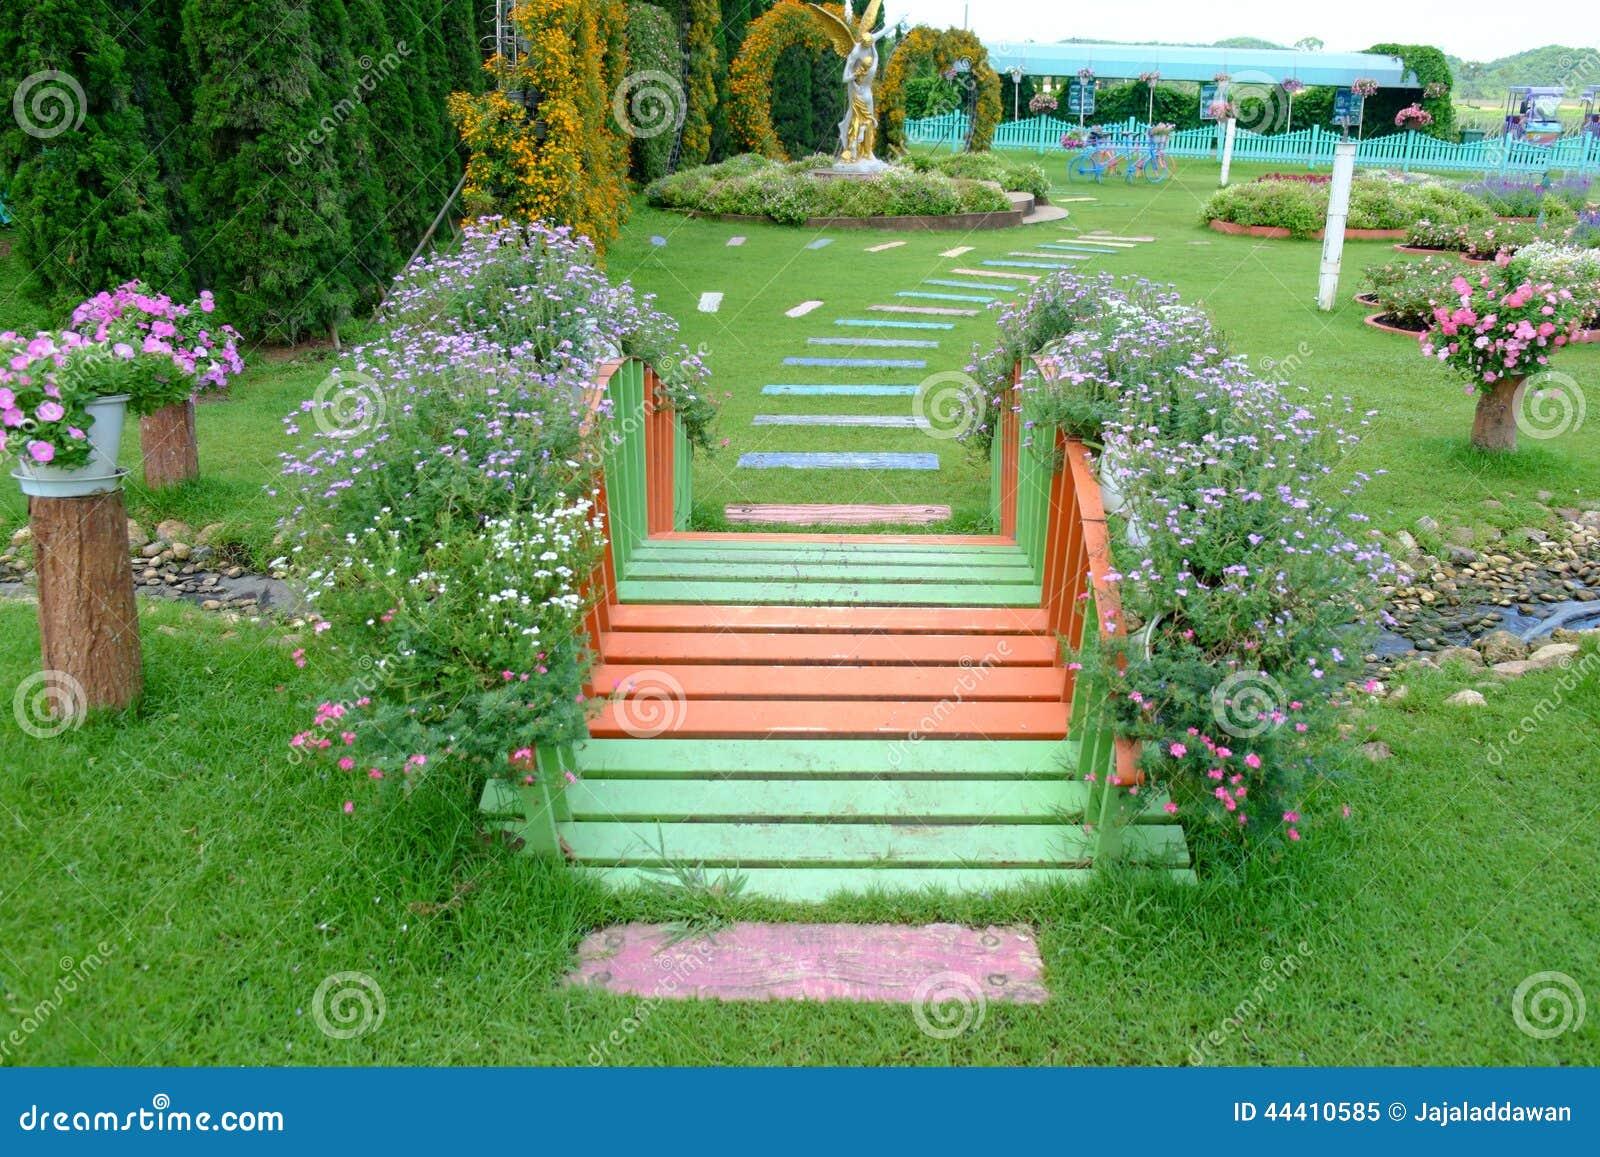 petit pont dans un jardin d 39 agr ment image stock image. Black Bedroom Furniture Sets. Home Design Ideas